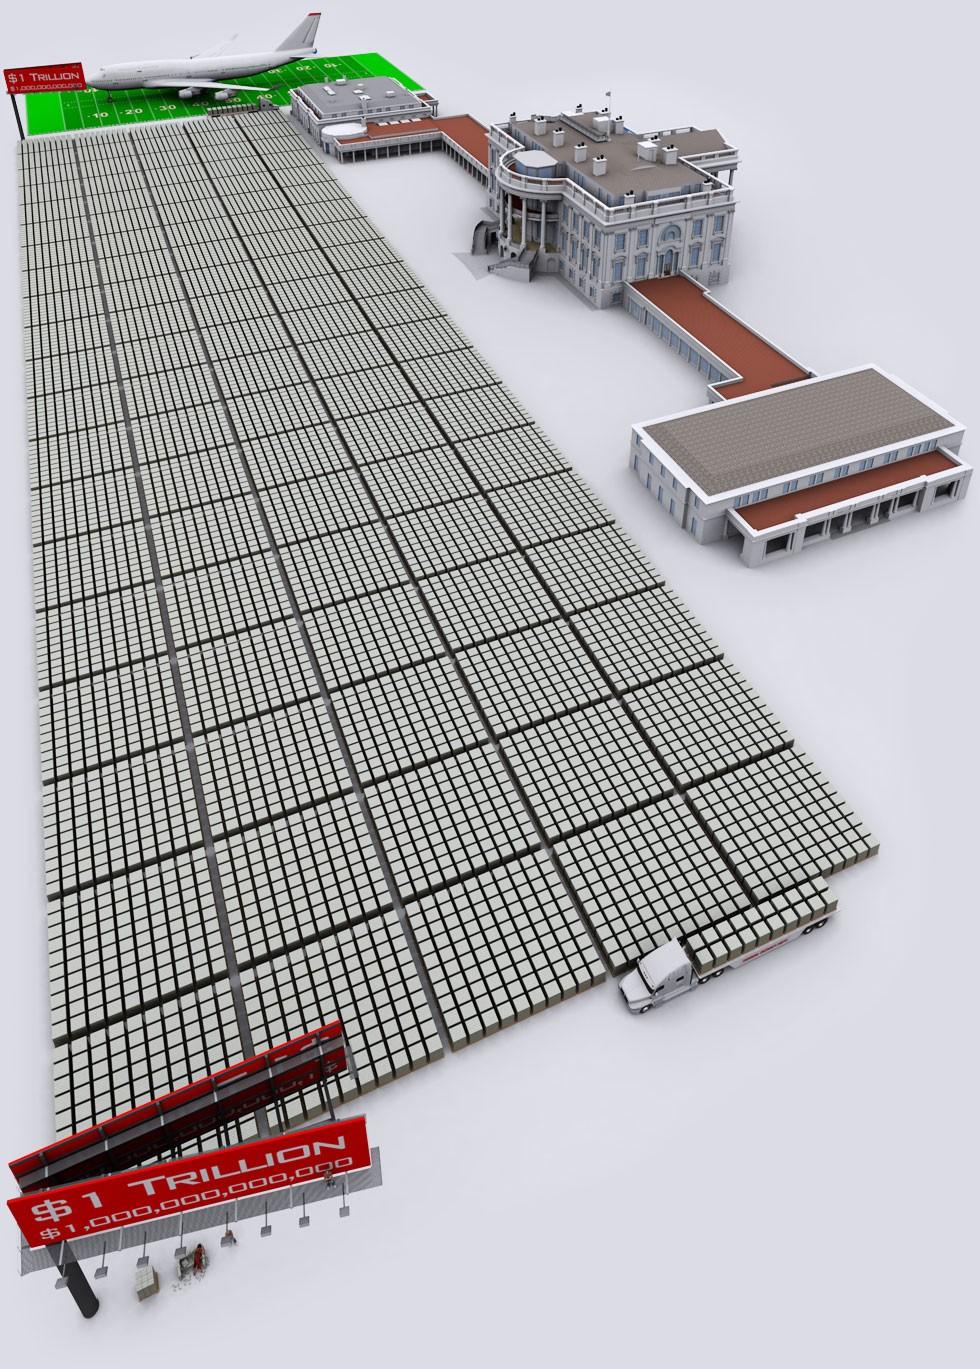 $1 trillion visualized